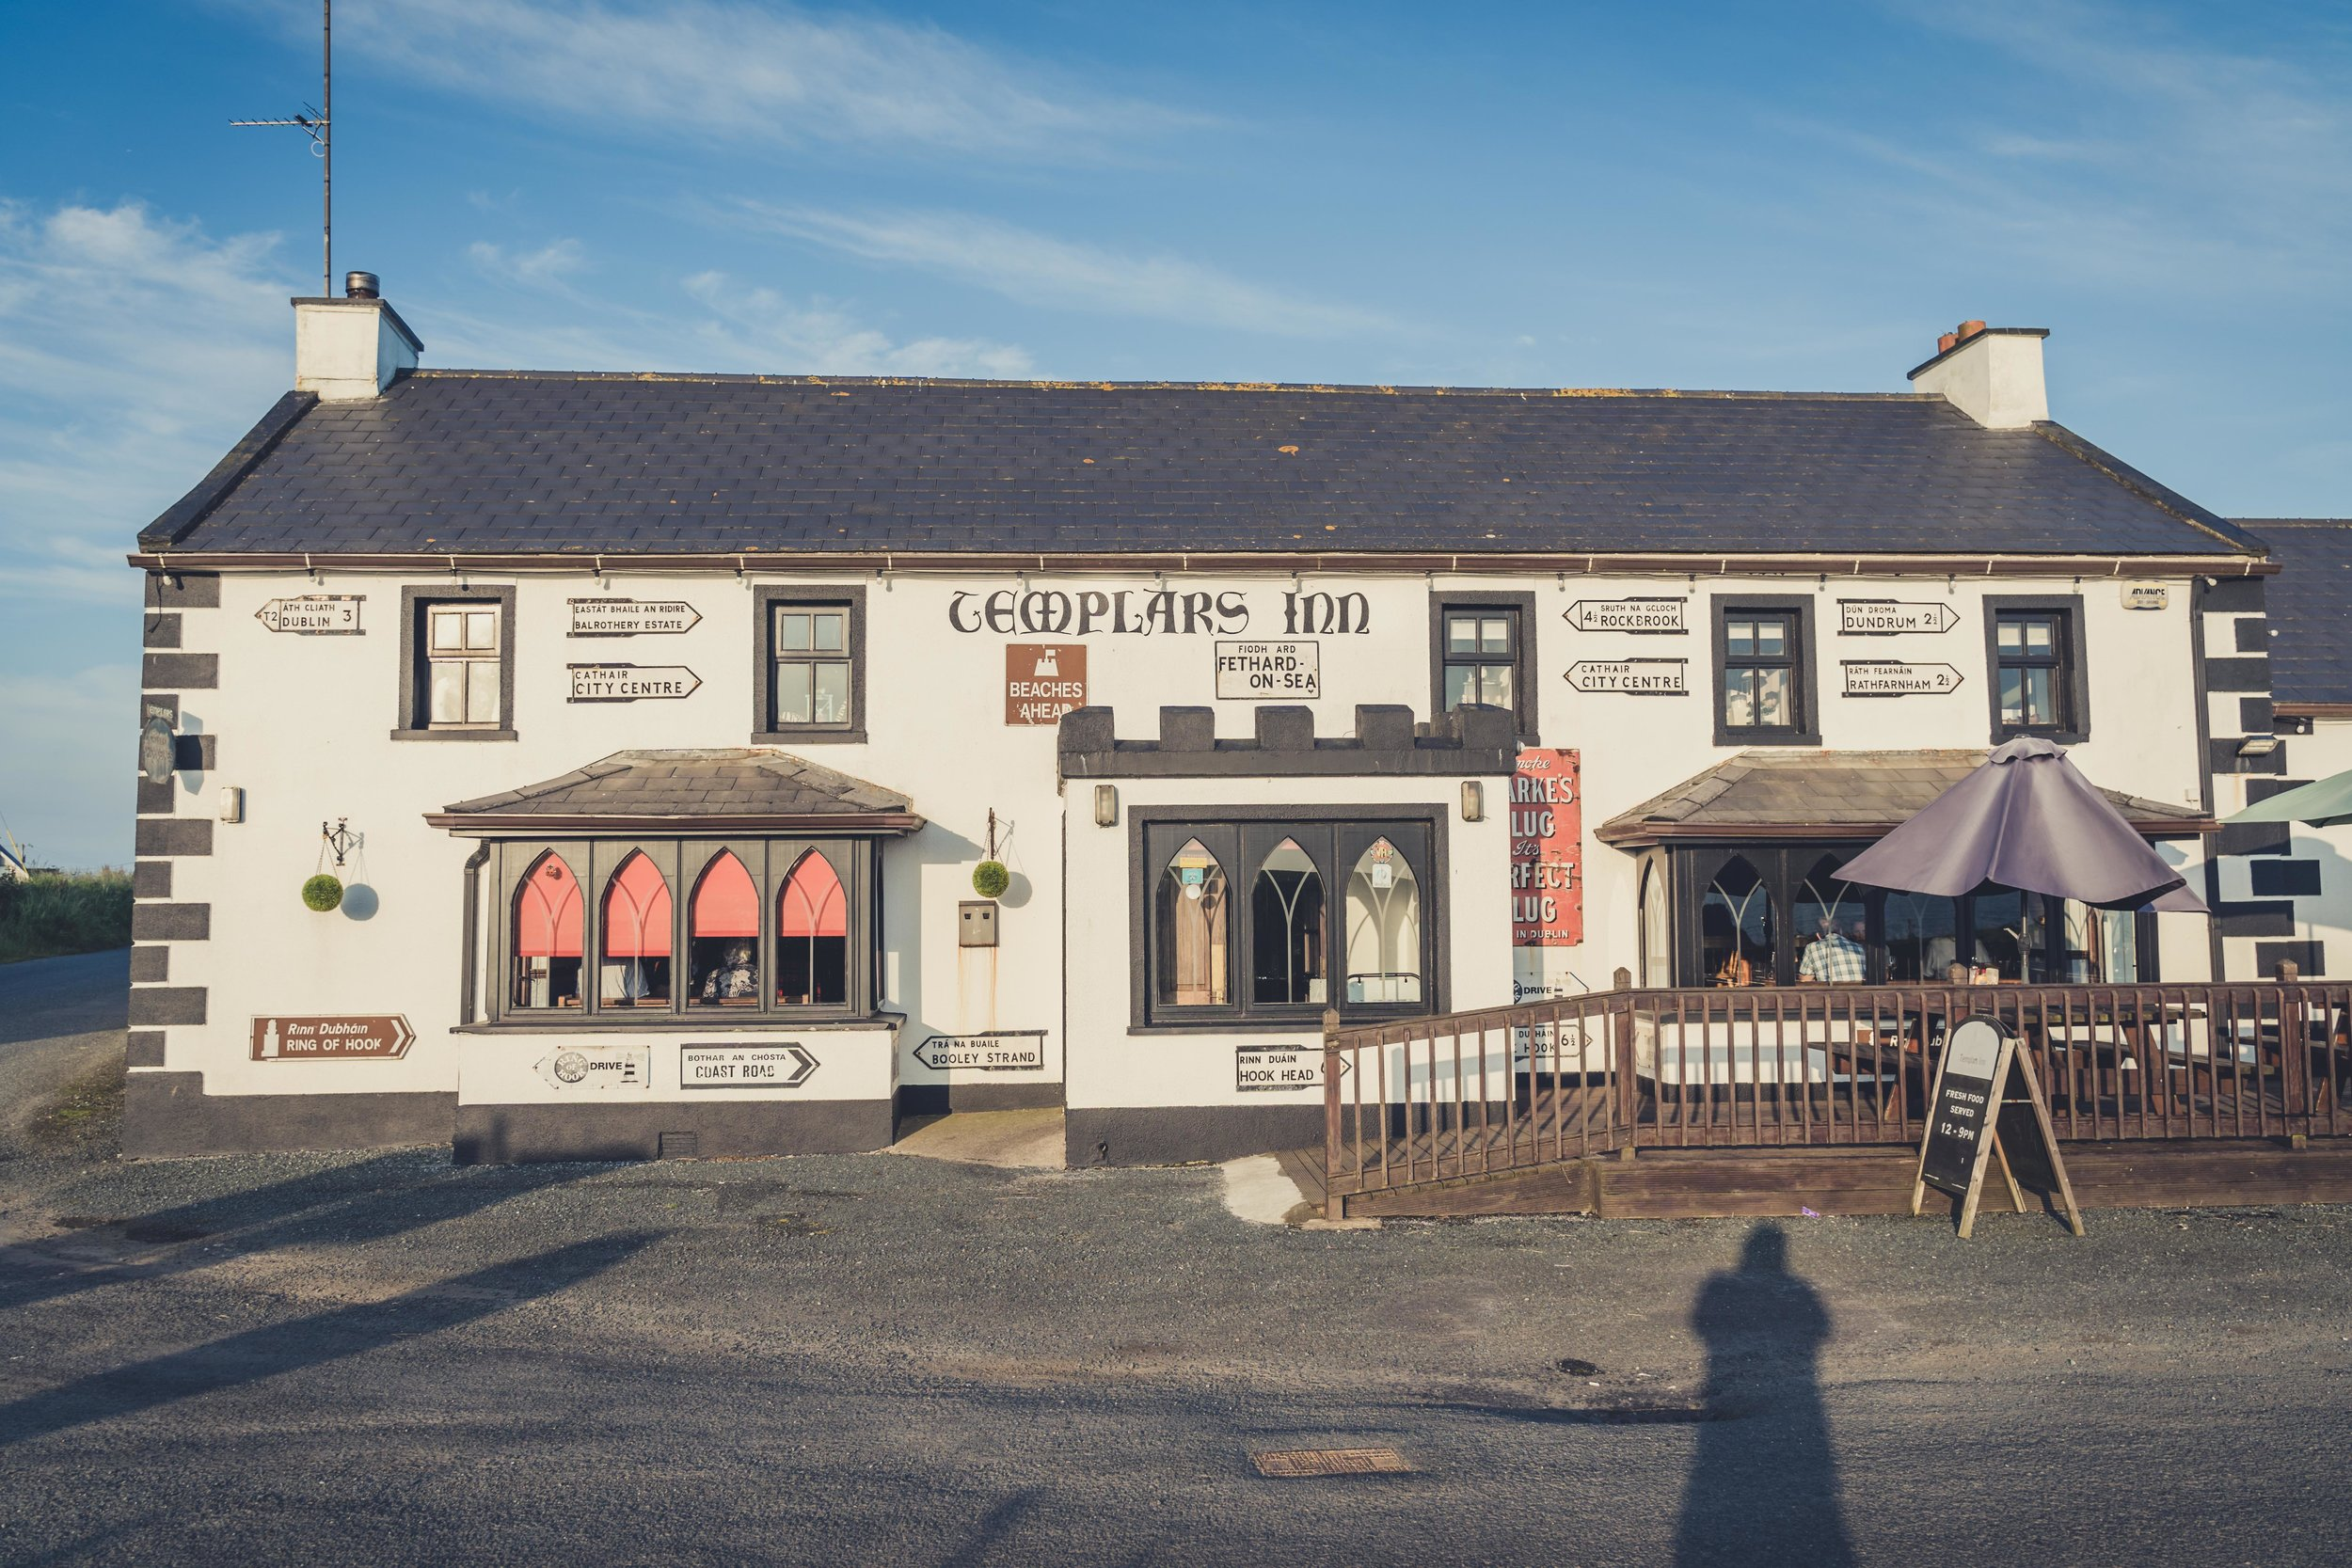 wexford ireland templars inn.jpg